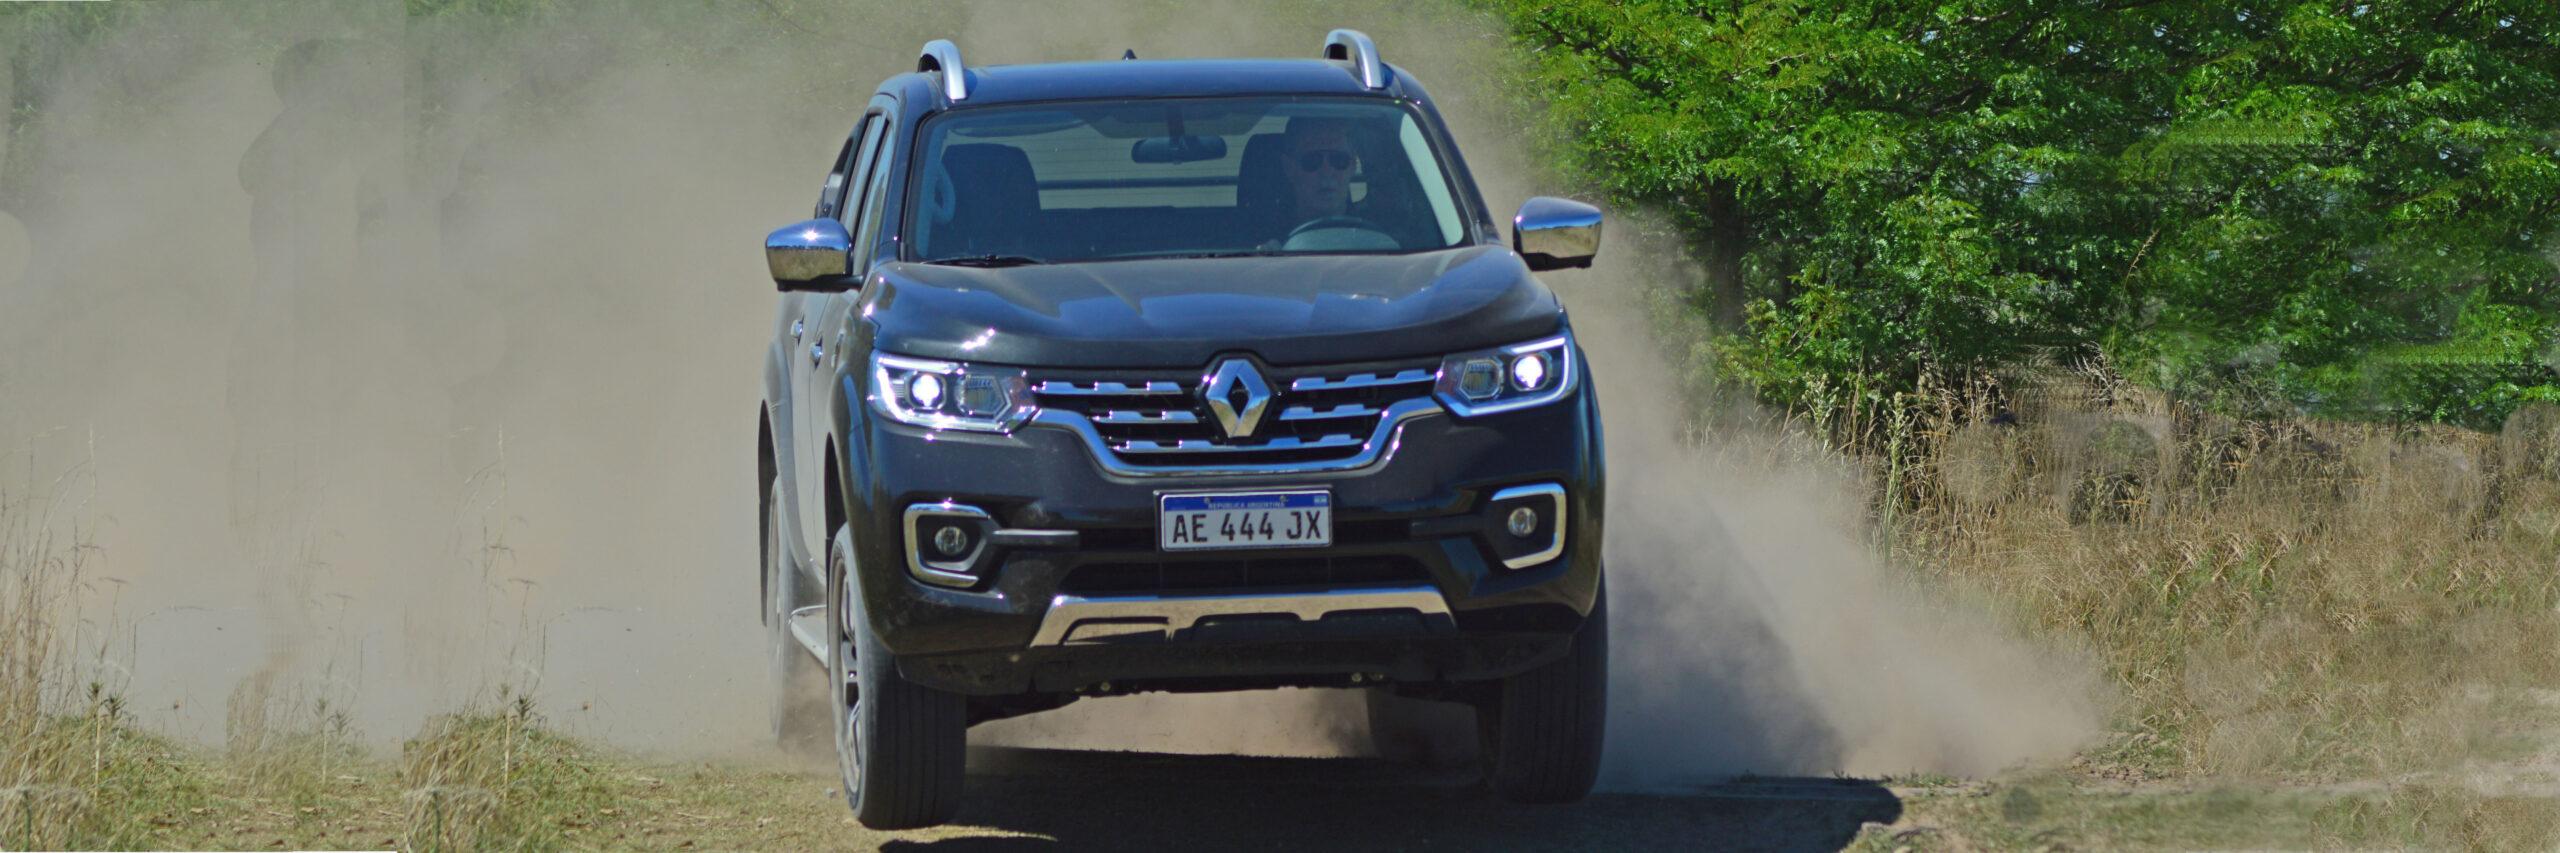 Test Drive Renault Alaskan Iconic A/T: Gran salto del rombo